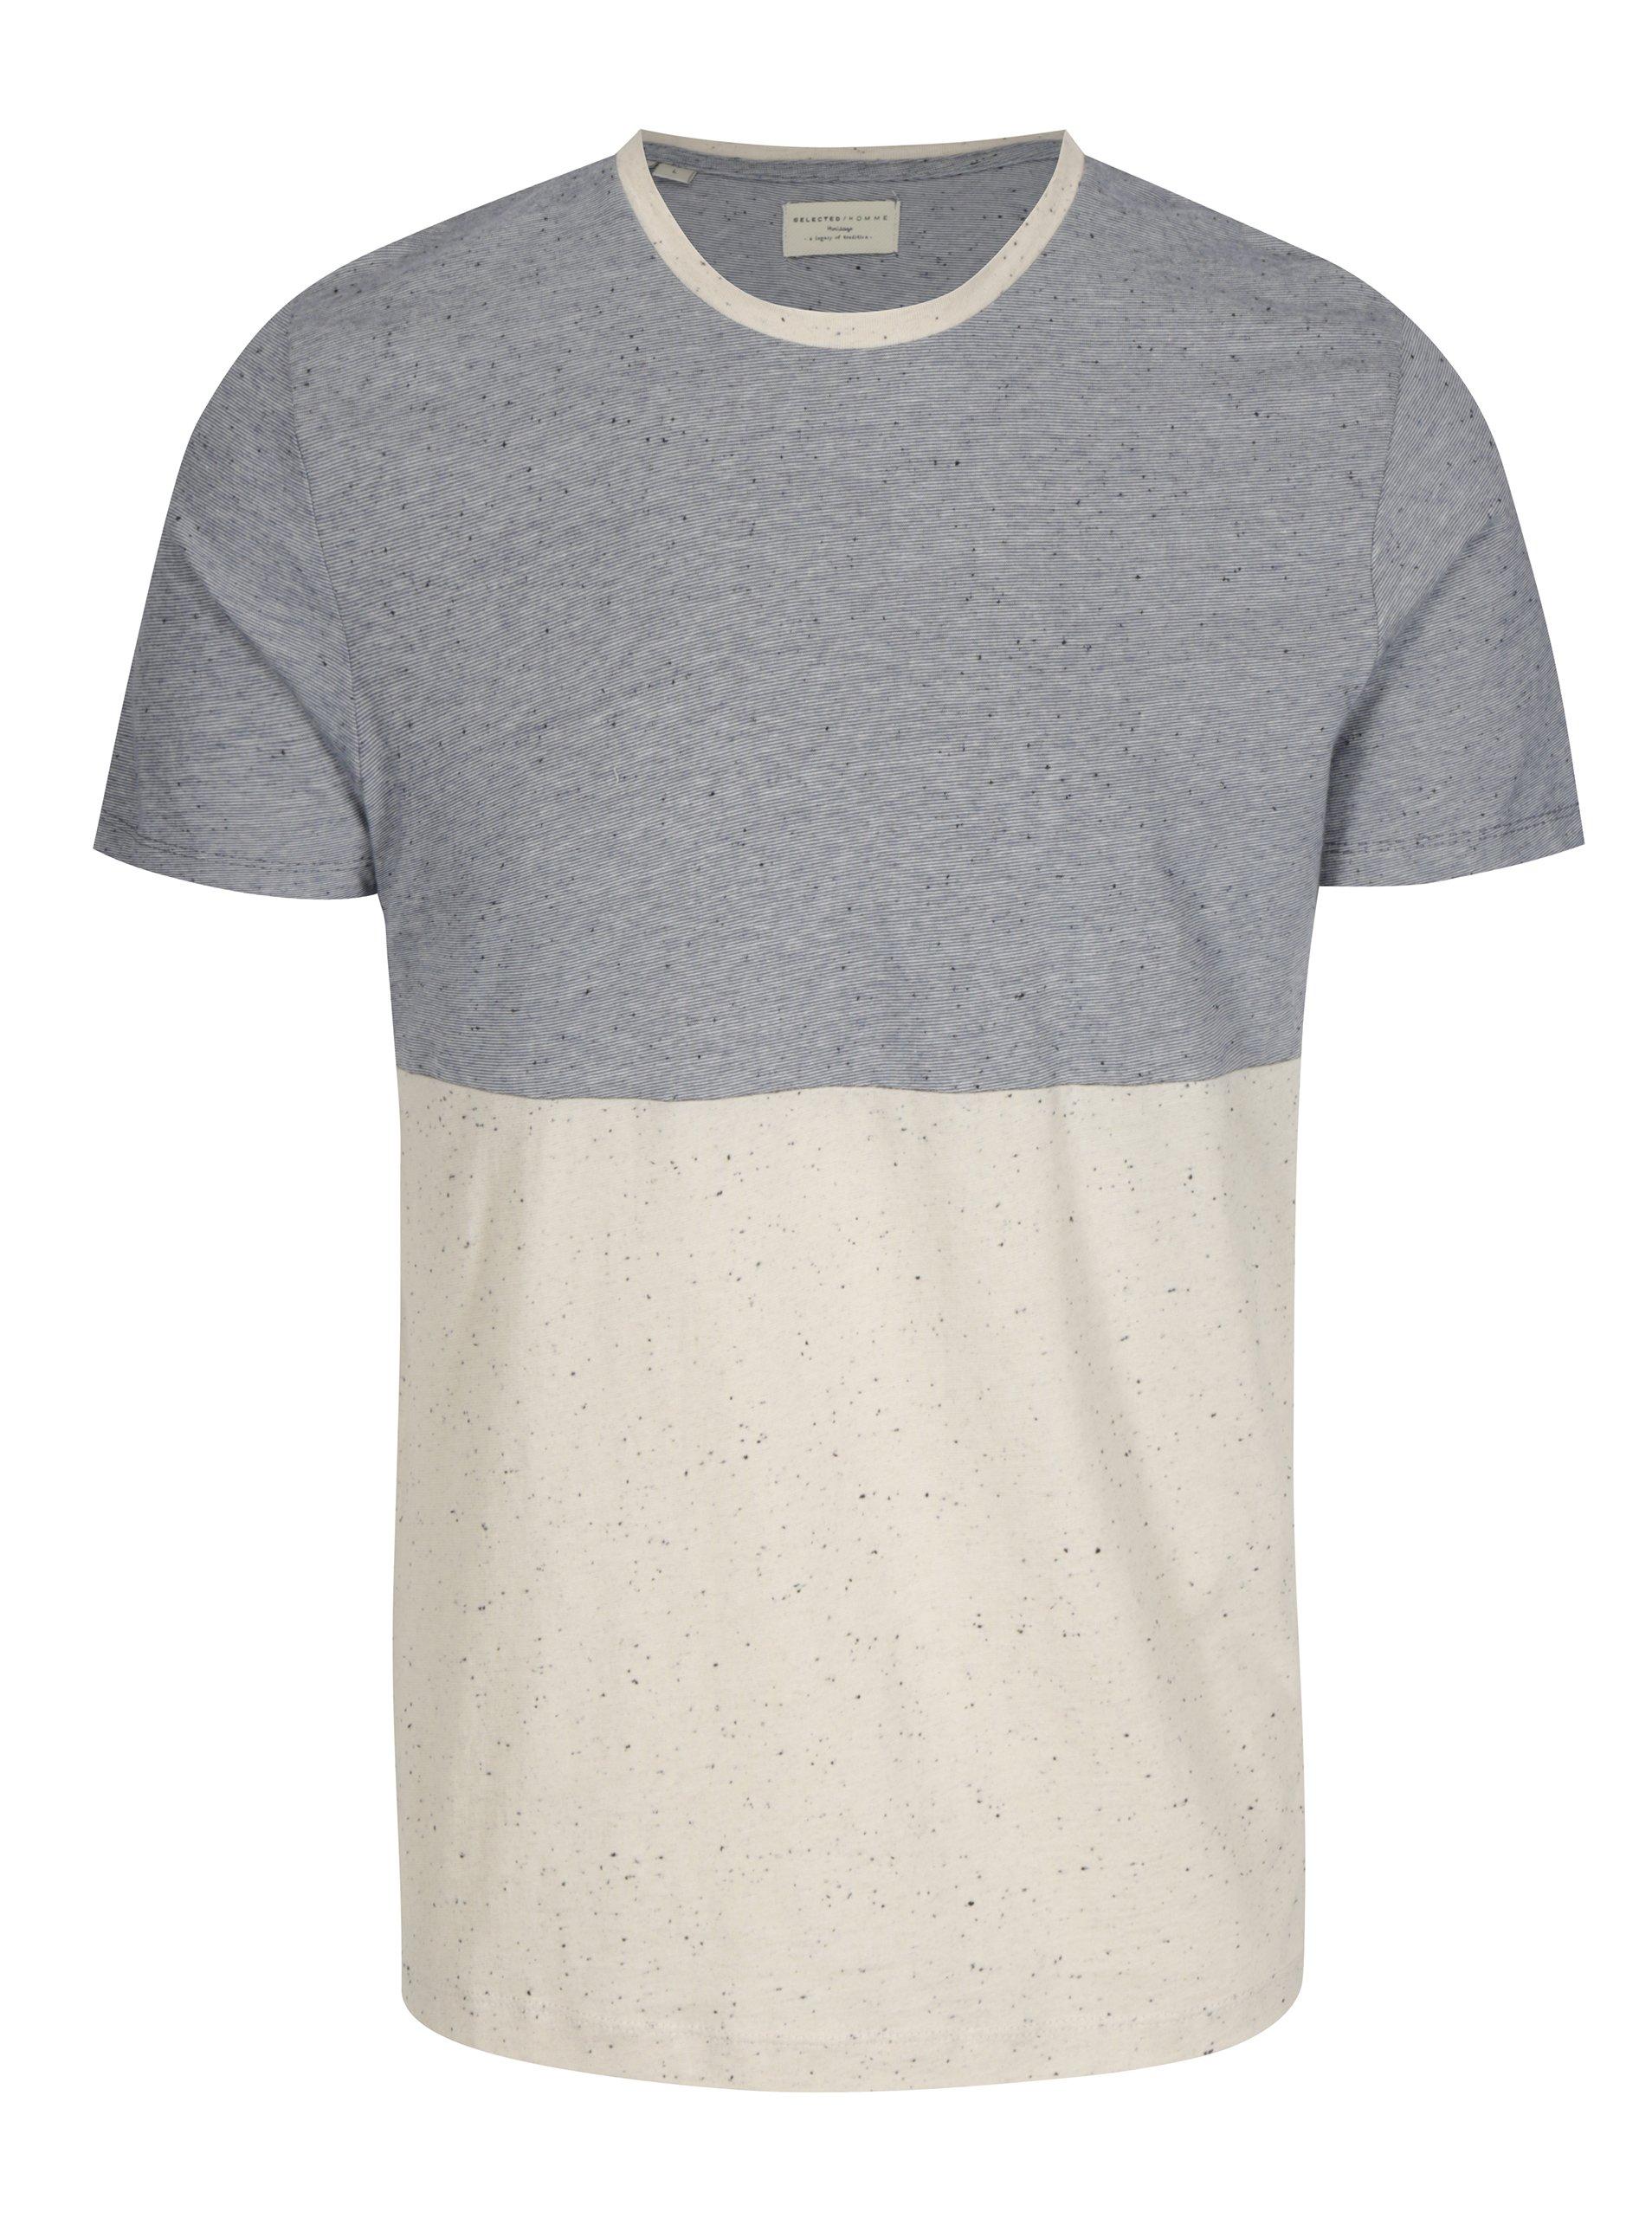 bfc0334d98f2 Béžovo-modré melírované tričko Selected Homme Tim